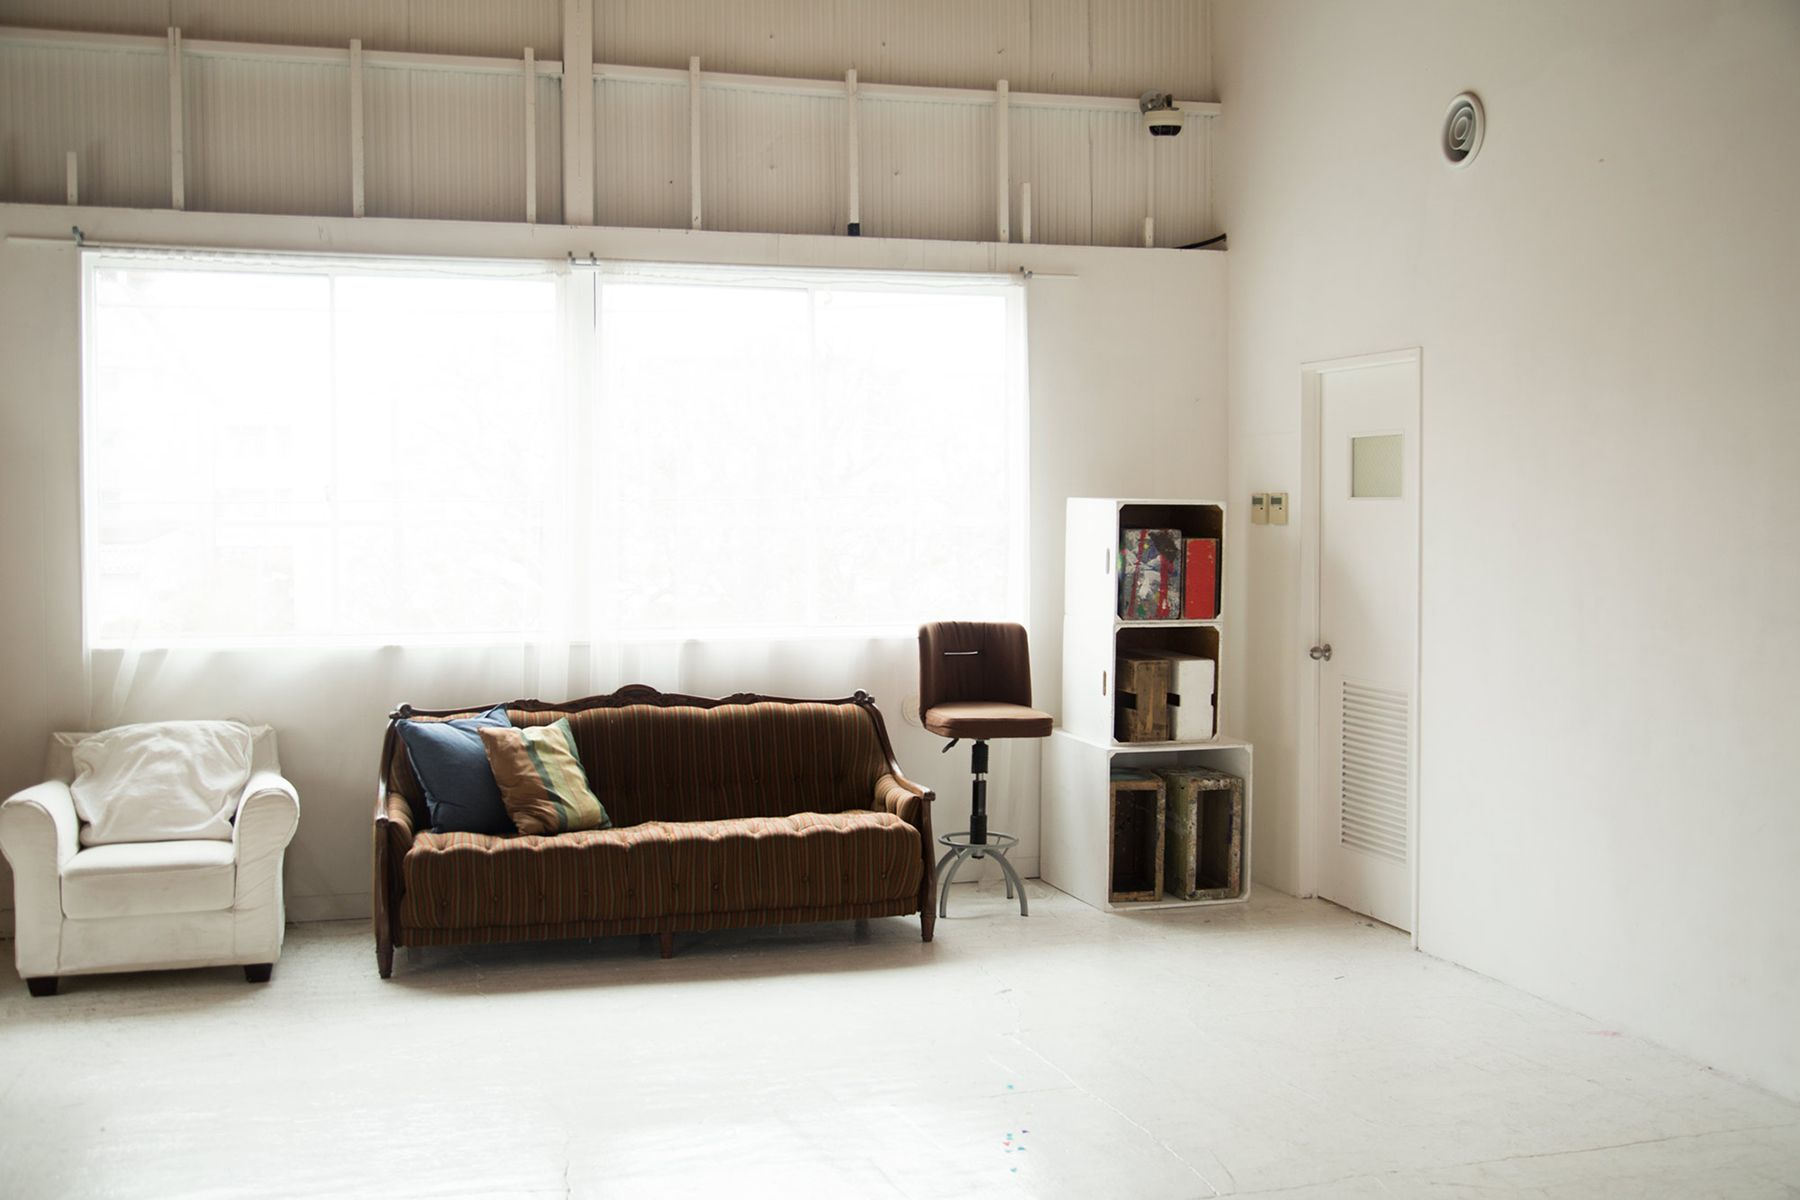 HOXTON STUDIO Loft/Garage (ホクストンスタジオ ロフト/ガレージ)Loft(2f)